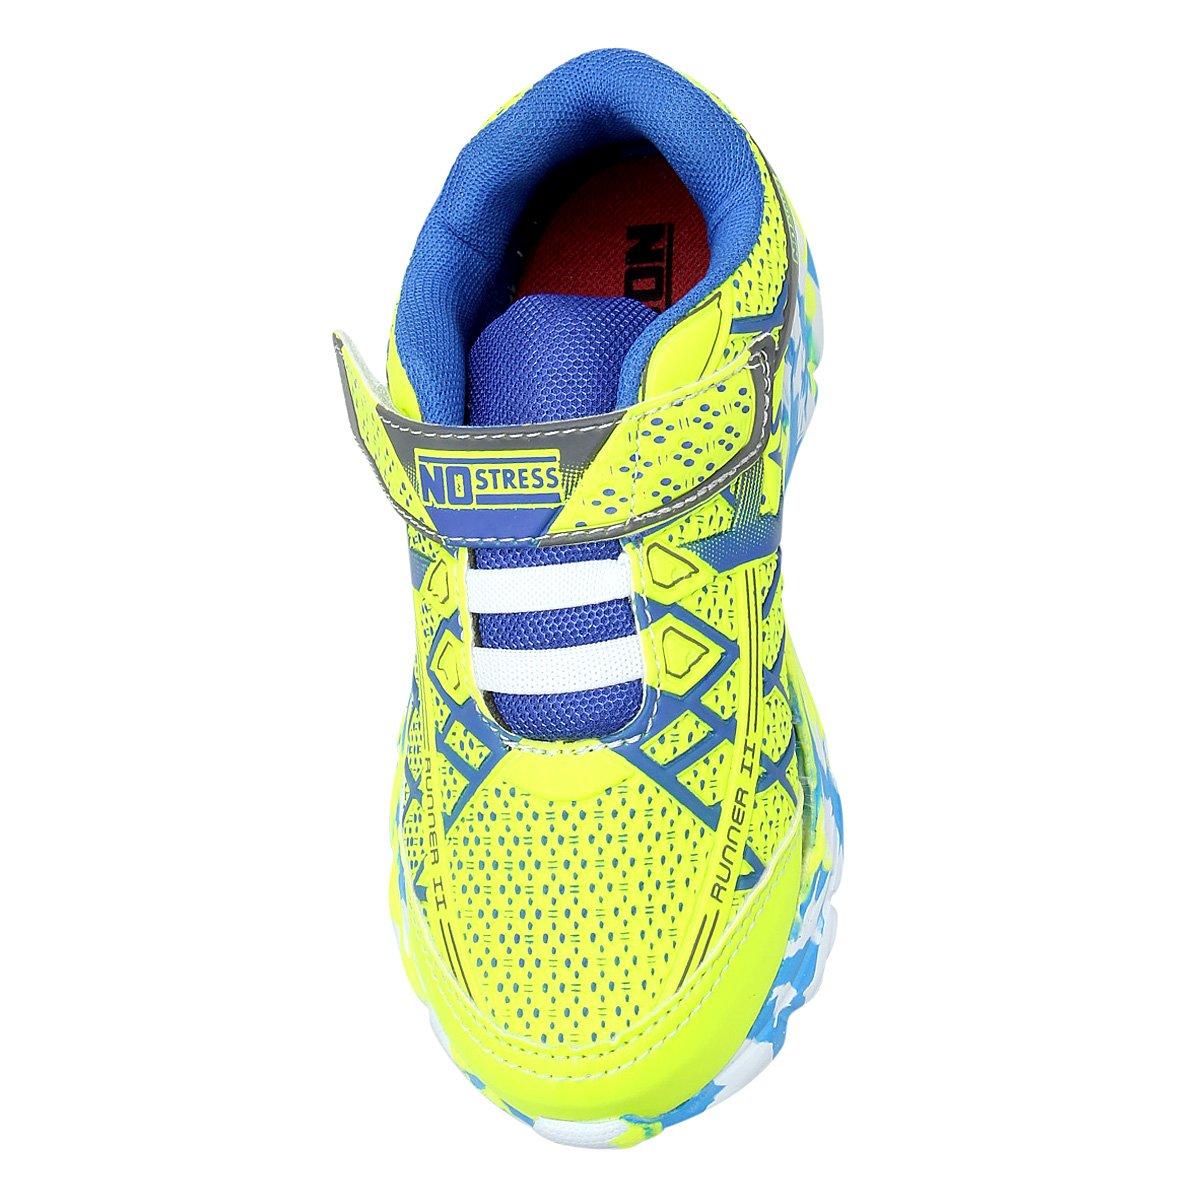 a3ffeebf903 Tênis Infantil No Stress Running Masculino - Amarelo - Compre Agora ...